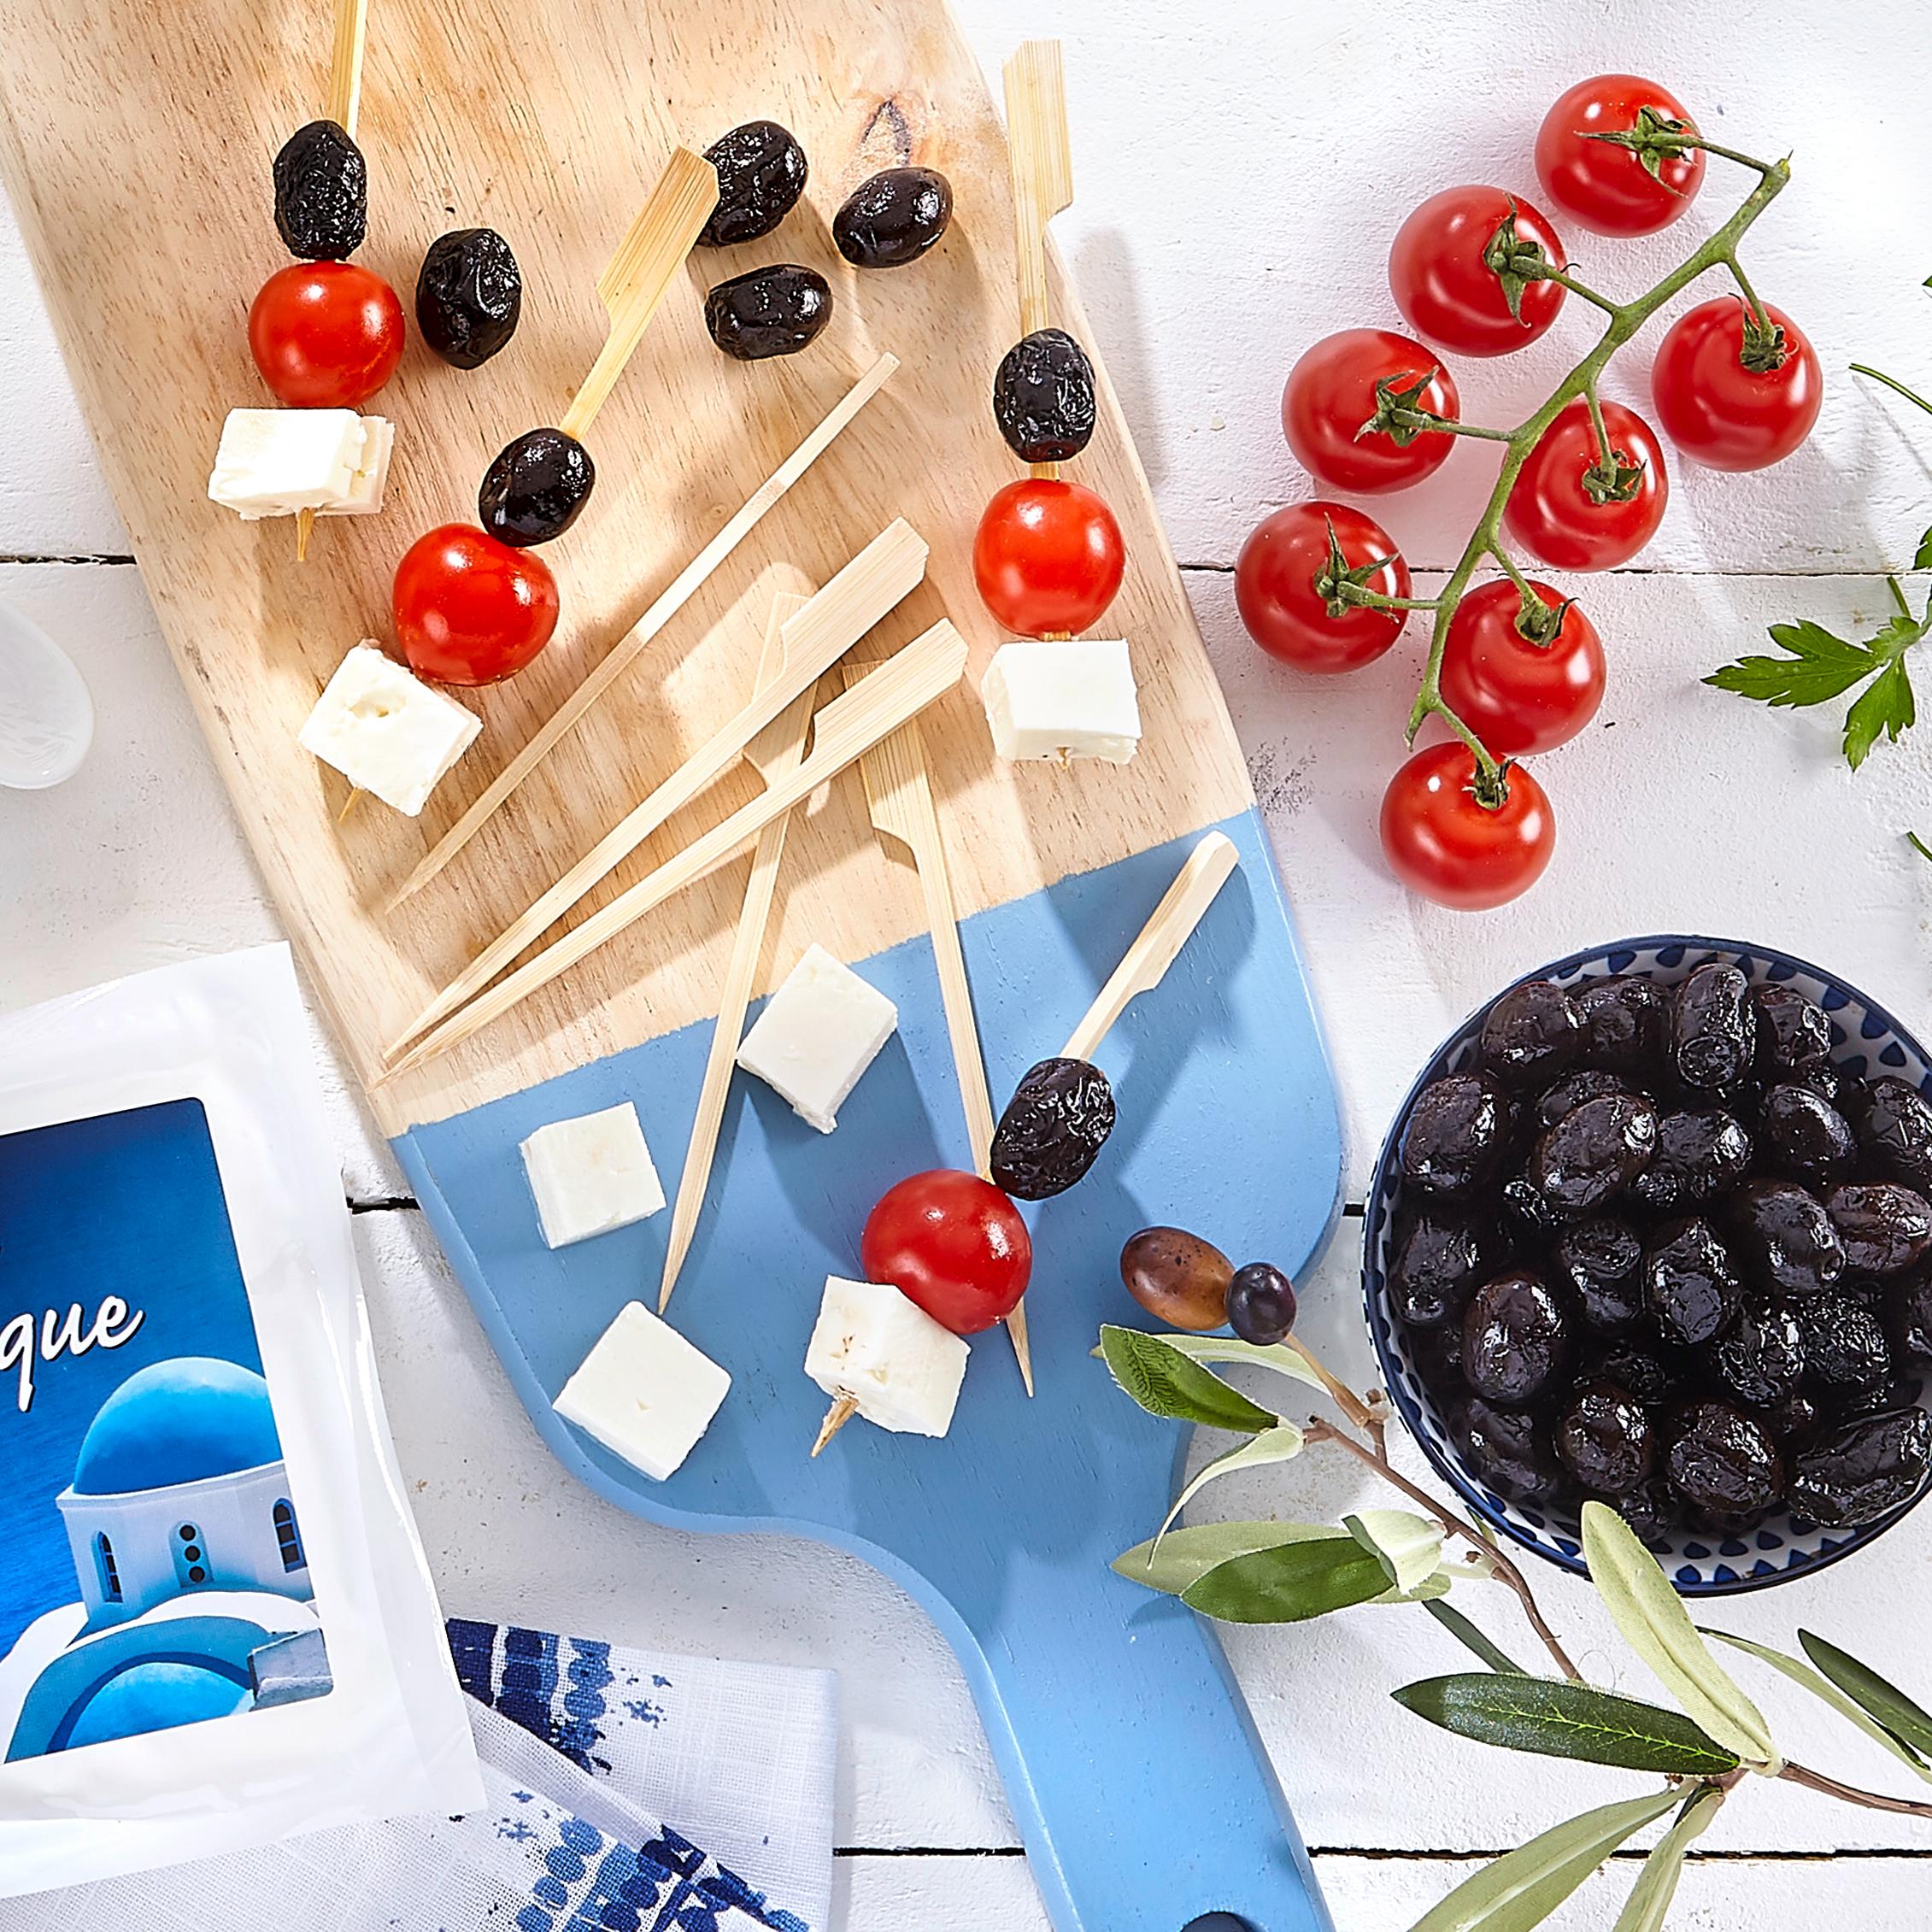 grece_preparation_2.jpg